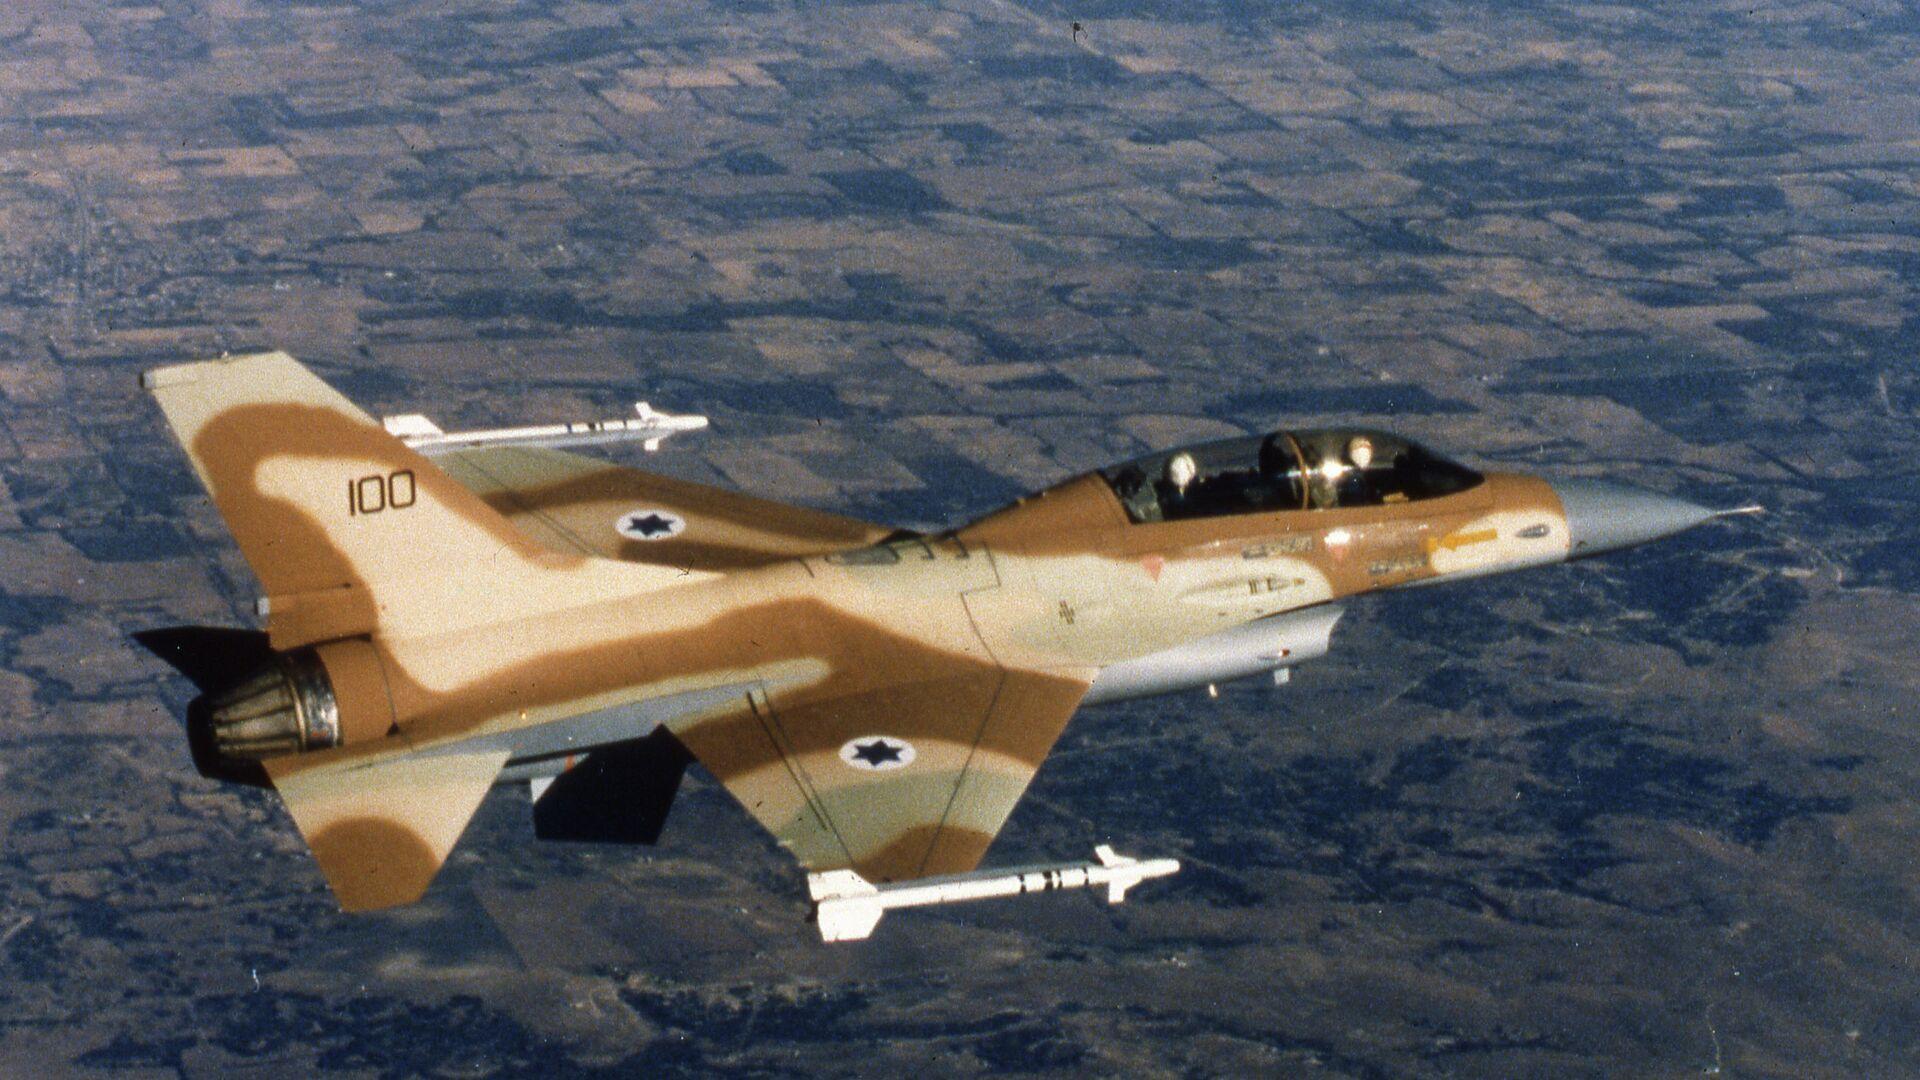 An Israeli Air Force F-16 jet fighter in flight over Israel 1980. - Sputnik Italia, 1920, 14.10.2021